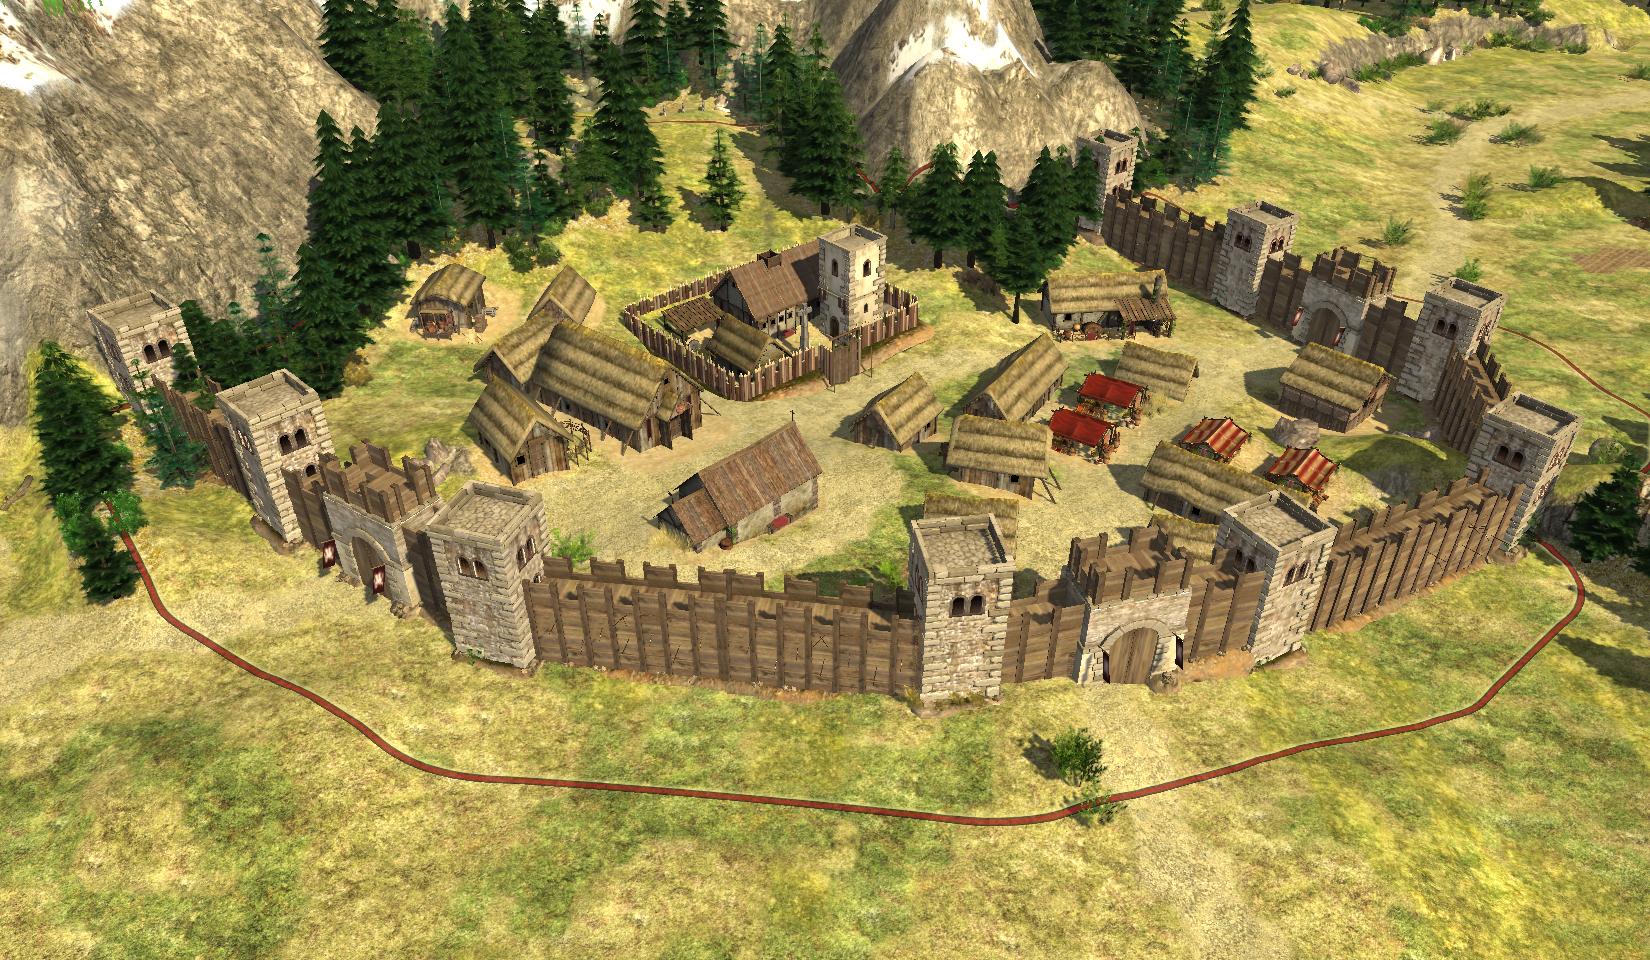 screenshot0265.png